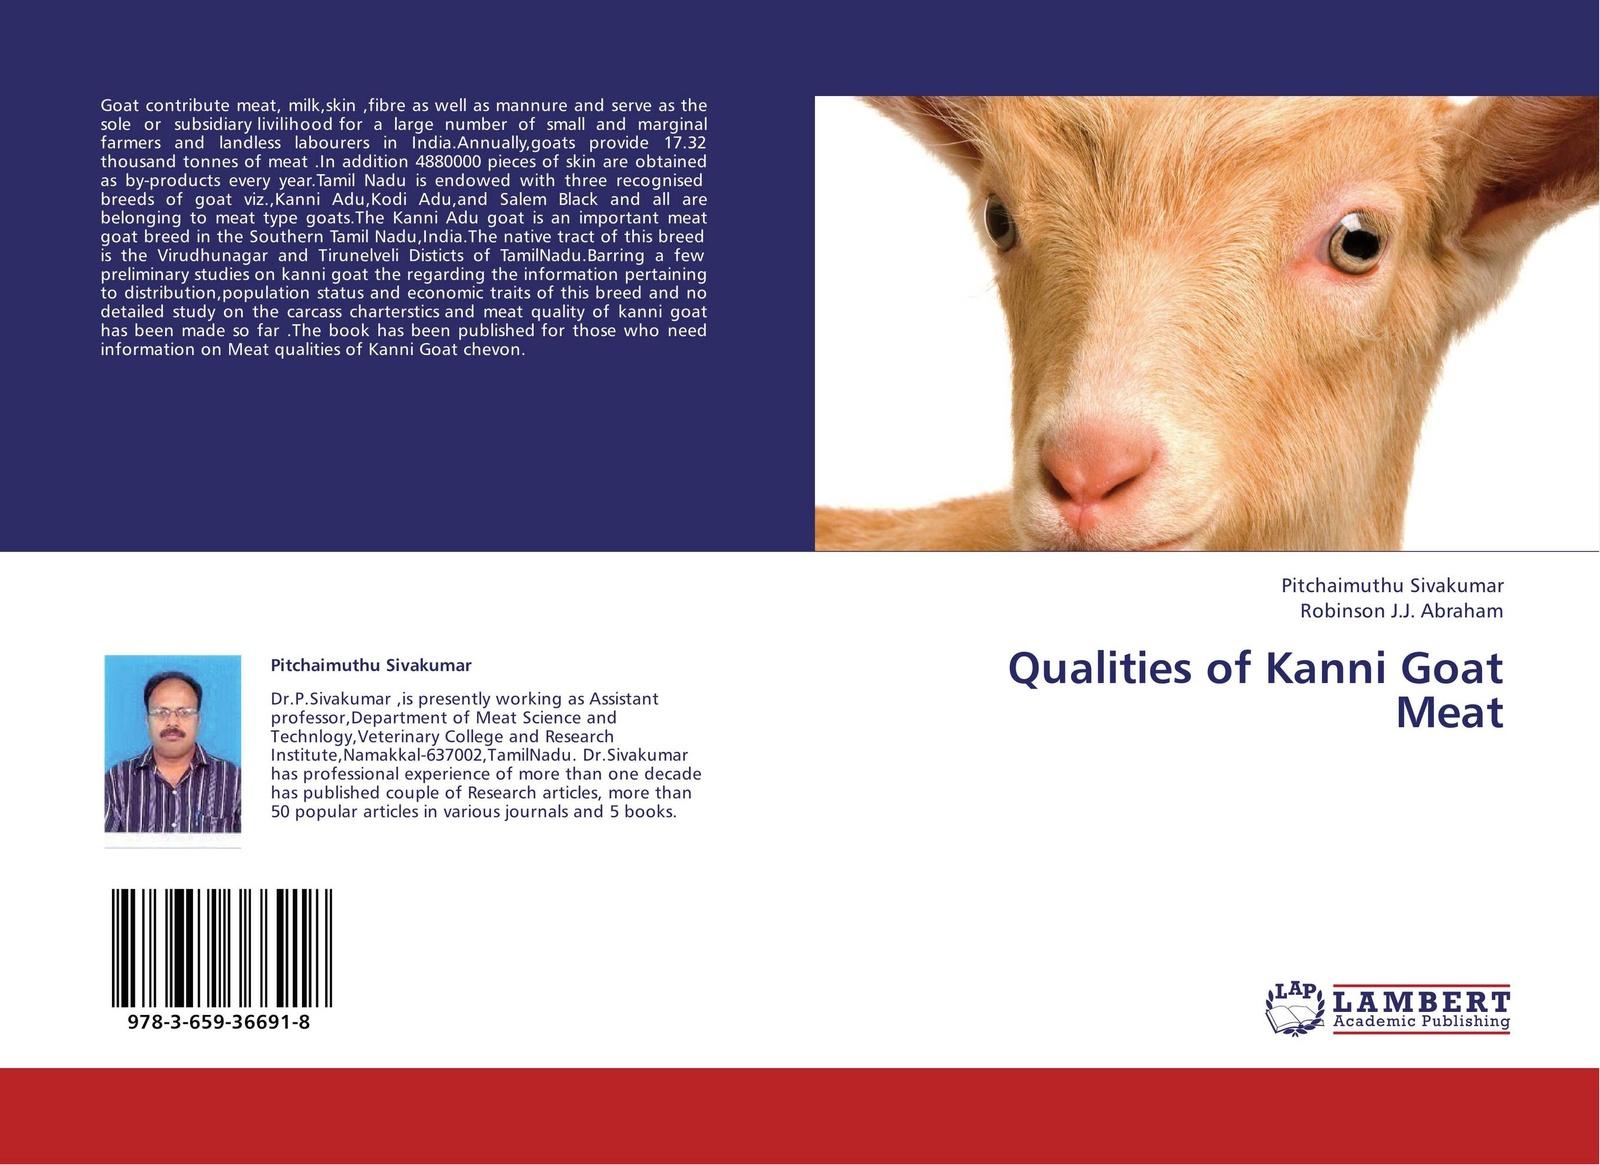 купить Pitchaimuthu Sivakumar and Robinson J.J. Abraham Qualities of Kanni Goat Meat по цене 4017 рублей